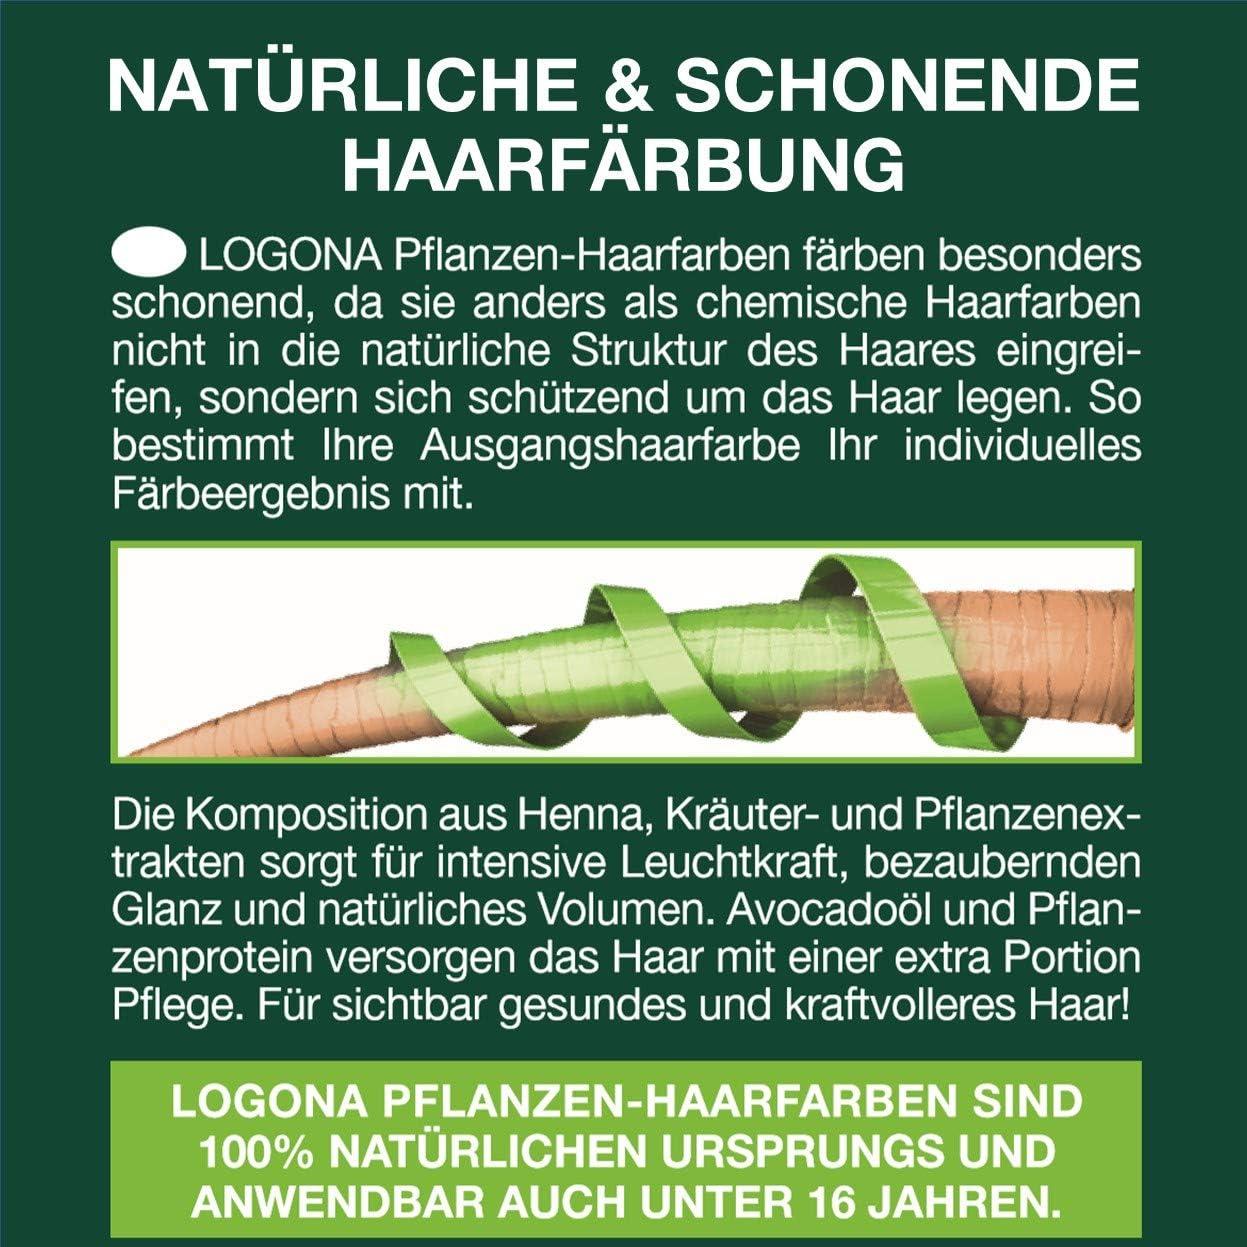 LOGONA Naturkosmetik Plantas Haarfarbe polvo 091 Chocolate, Vegan & Natural, Braune Natur-Haarfarbe con Henna & Shikakai, coloración, 100 g